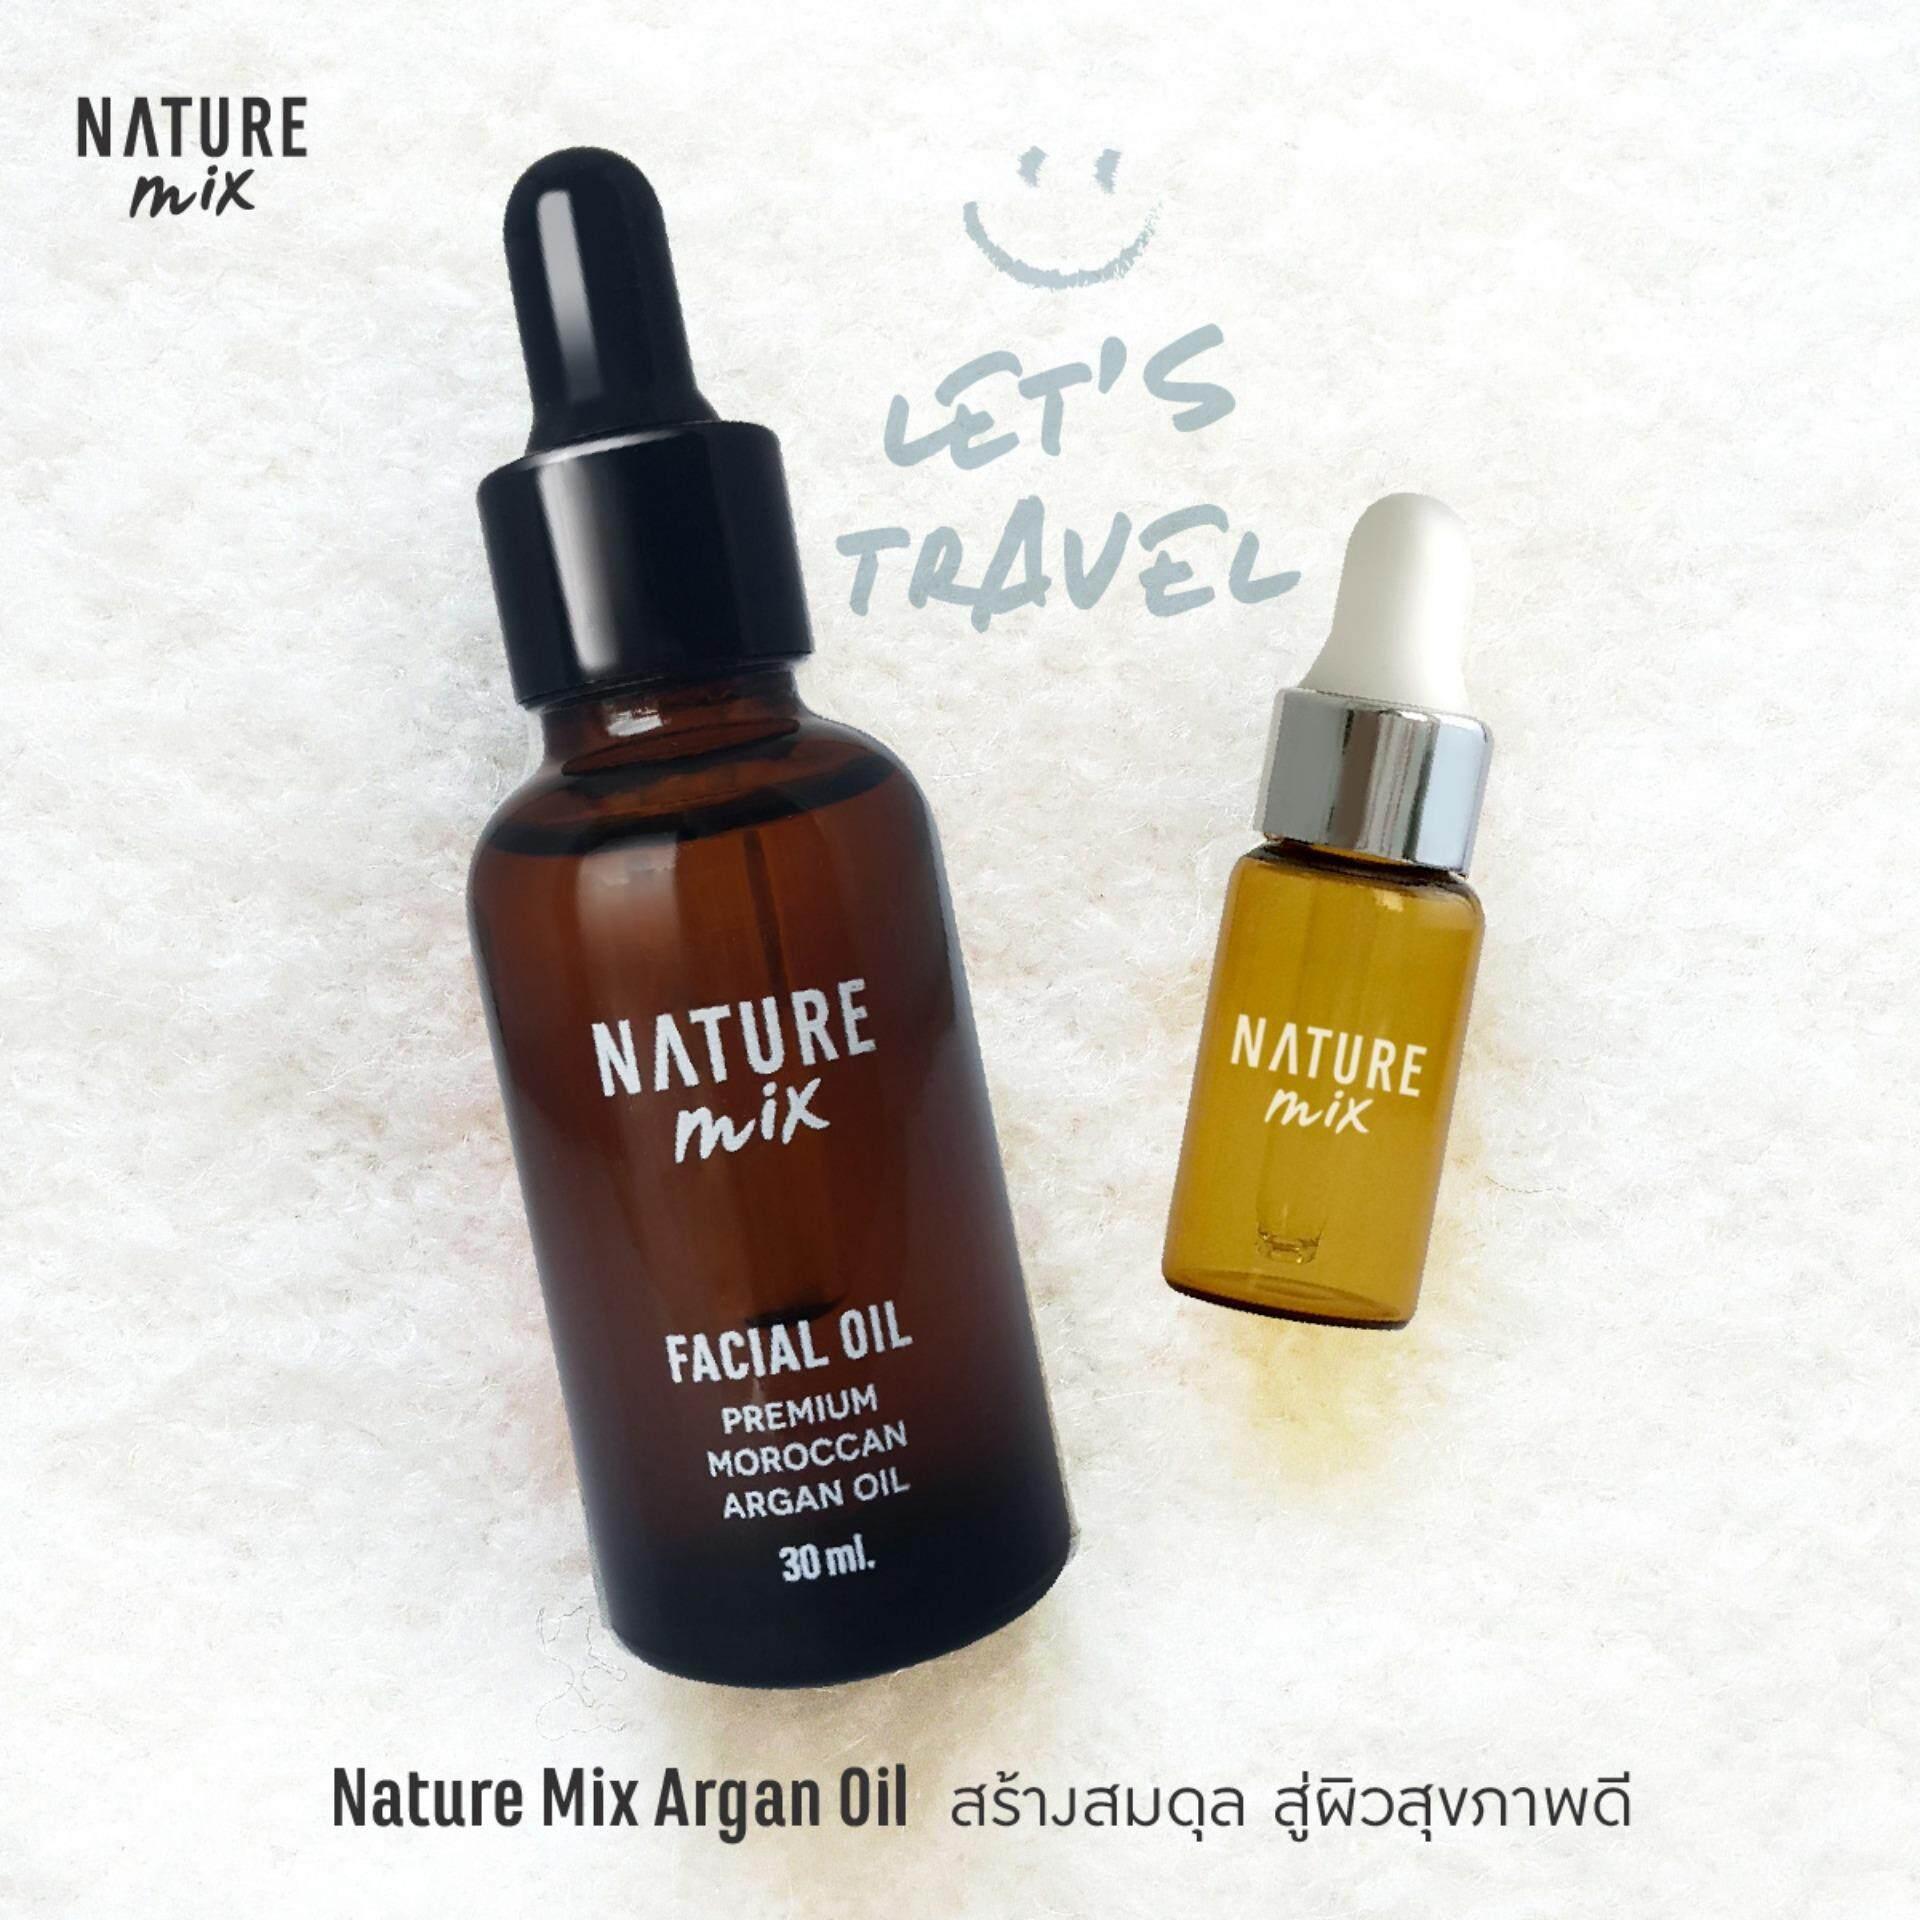 Naturemix Argan Oil อาร์แกน ออยล์ 30Ml พร้อมขวดแบ่งสำหรับเดินทาง กรุงเทพมหานคร